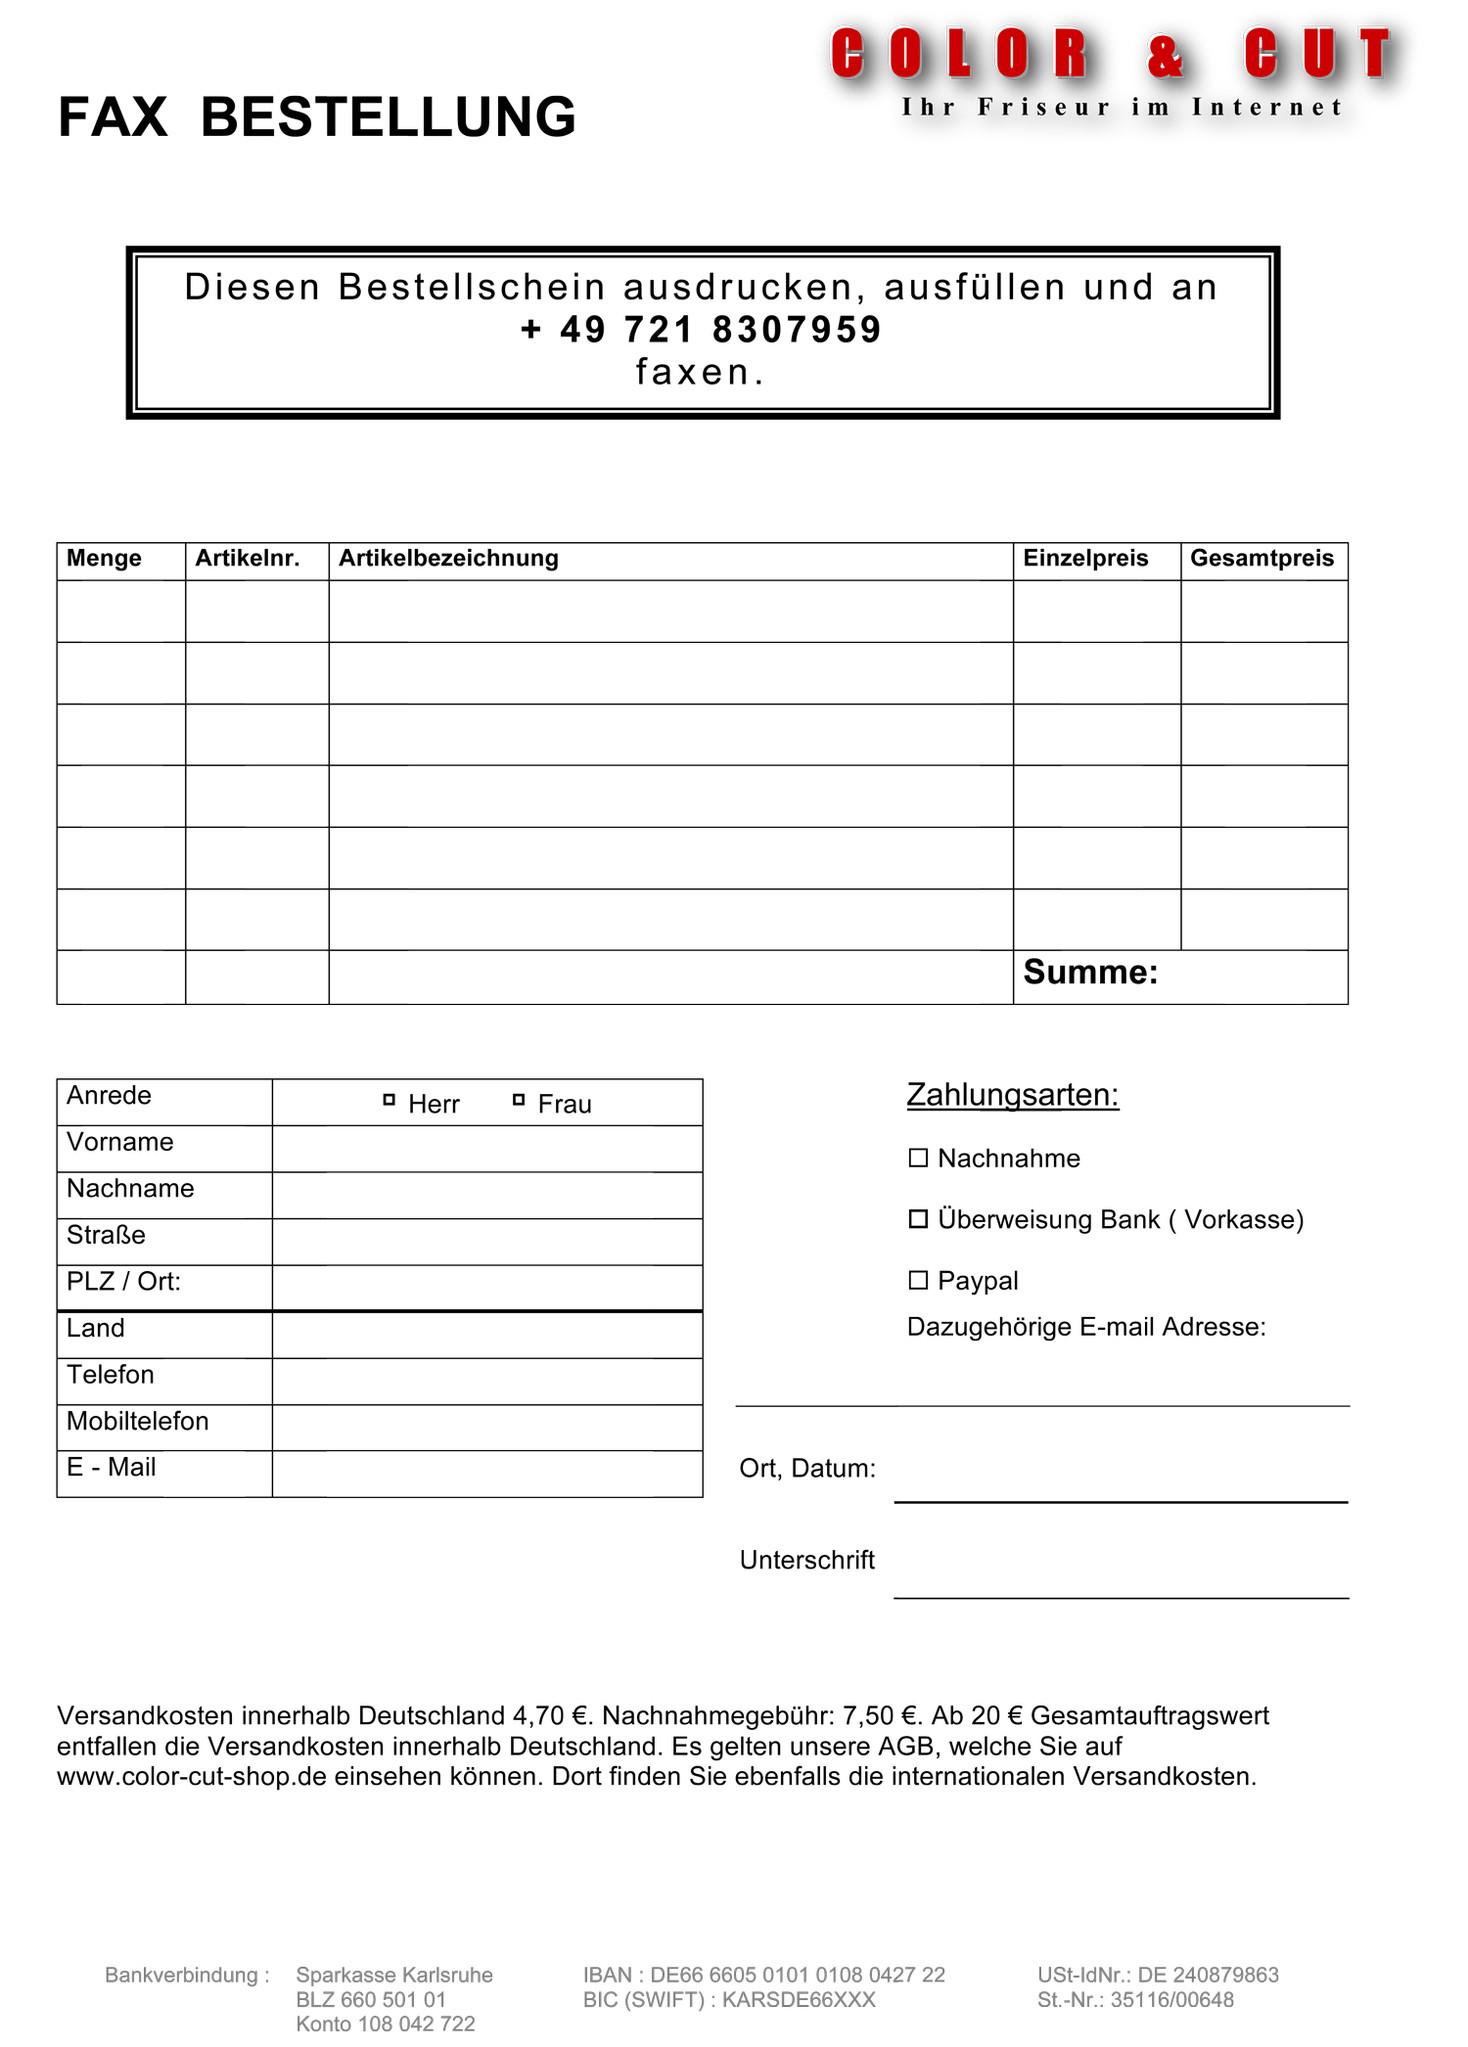 https://static.webshopapp.com/shops/021222/files/005827601/faxformular.jpg